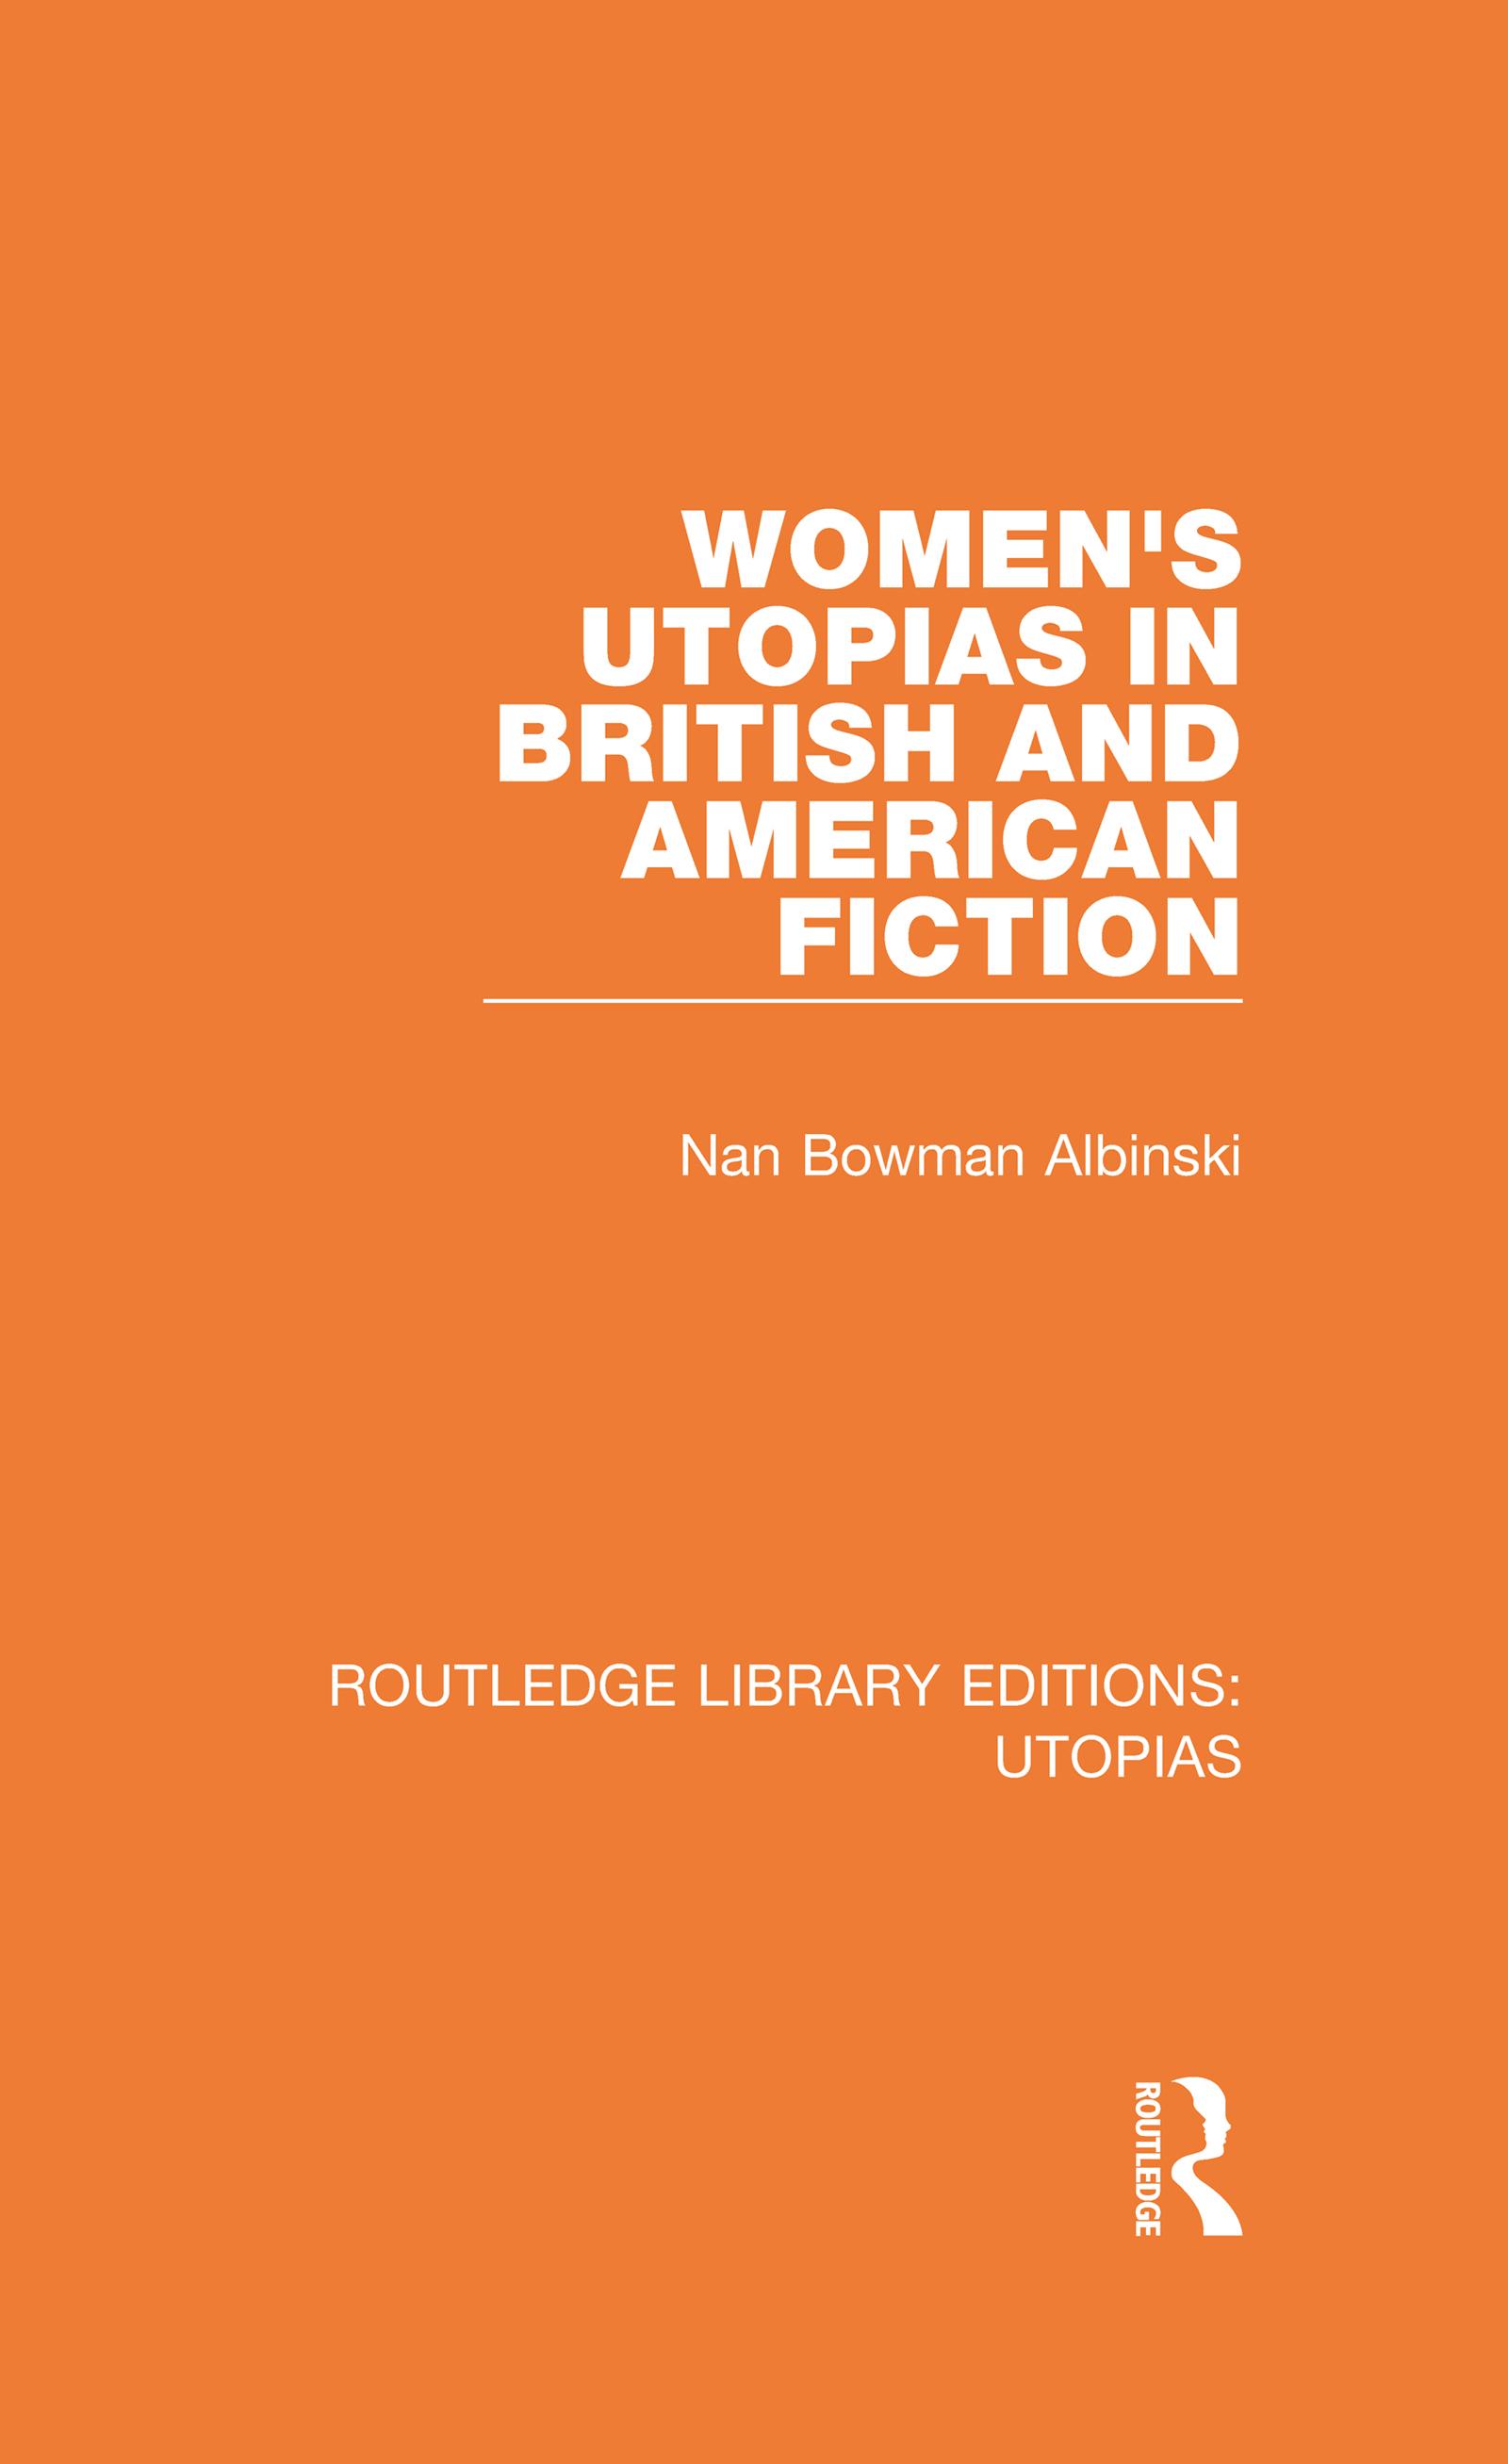 Women's Utopias in British and American Fiction